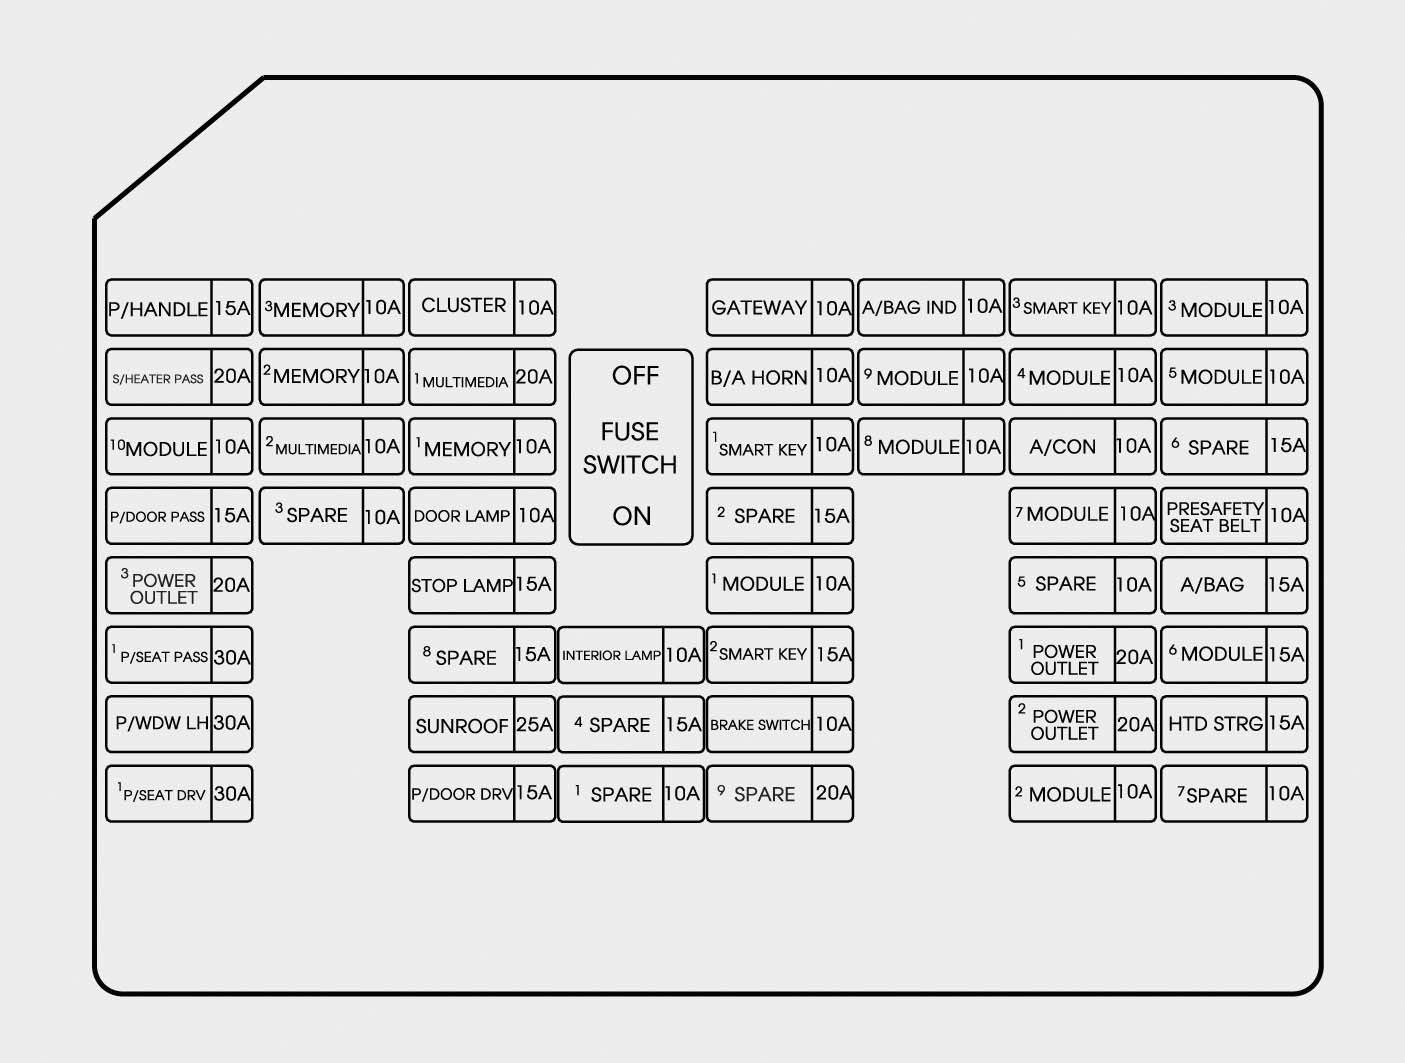 hyundai atos fuse box diagram kw 1993  drivers side fuse box diagram of hyundai santa fe 2010  fuse box diagram of hyundai santa fe